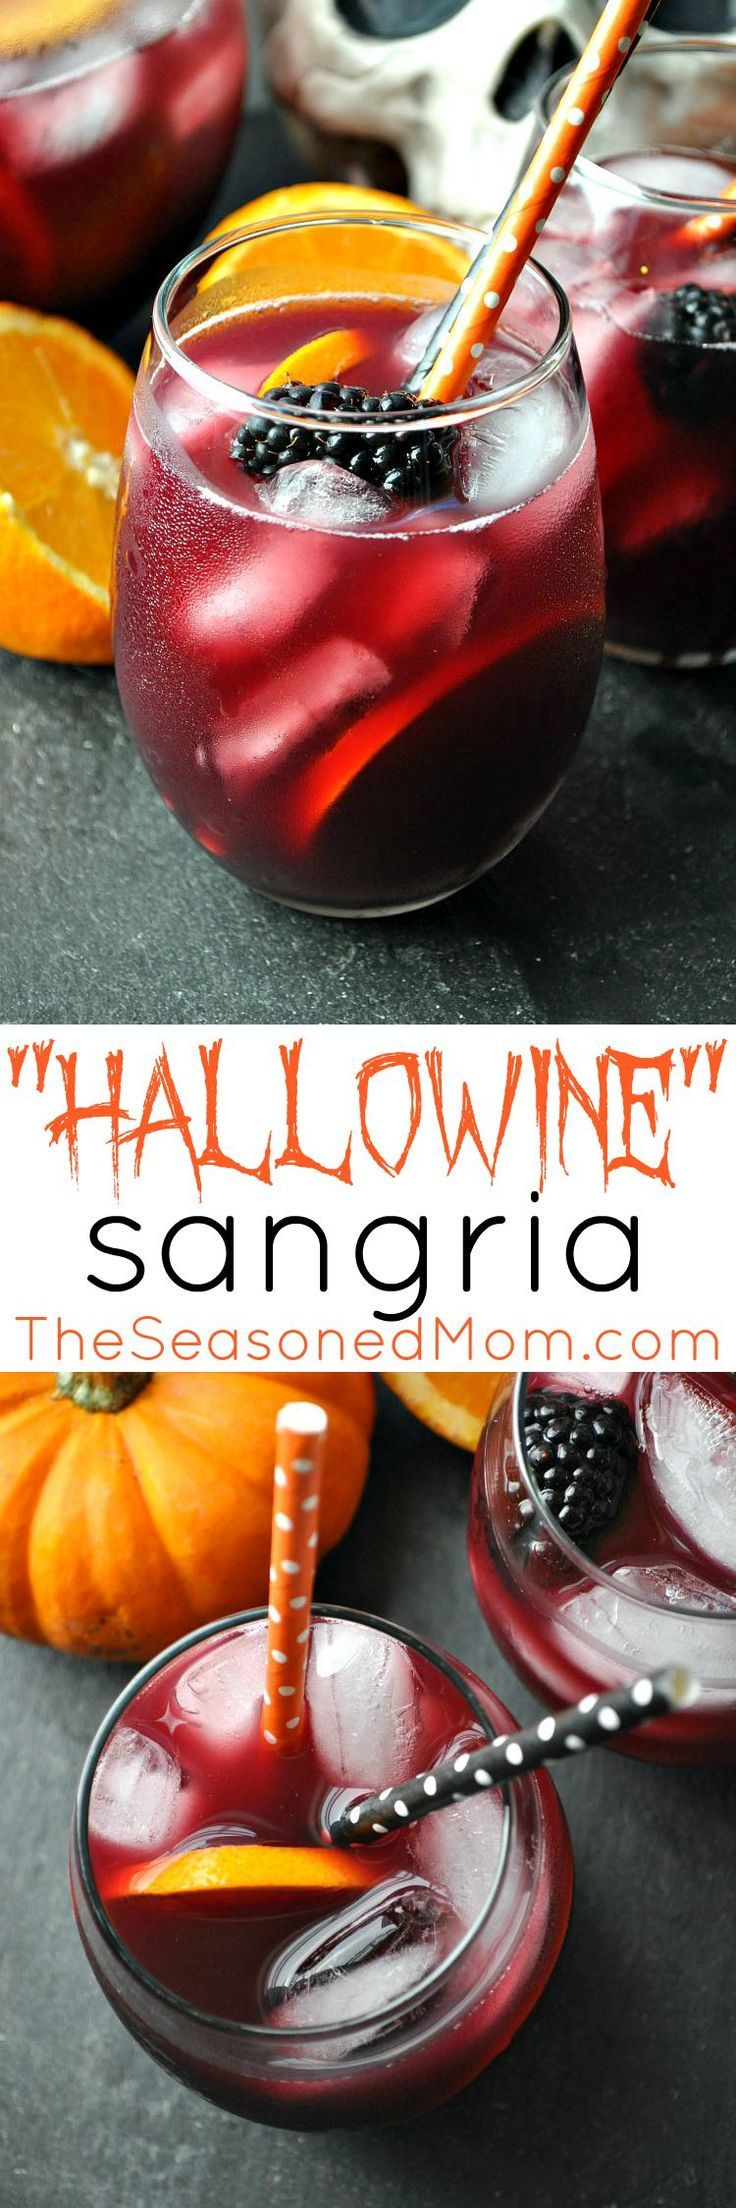 Hallowine Sangria Halloween food for party, Halloween